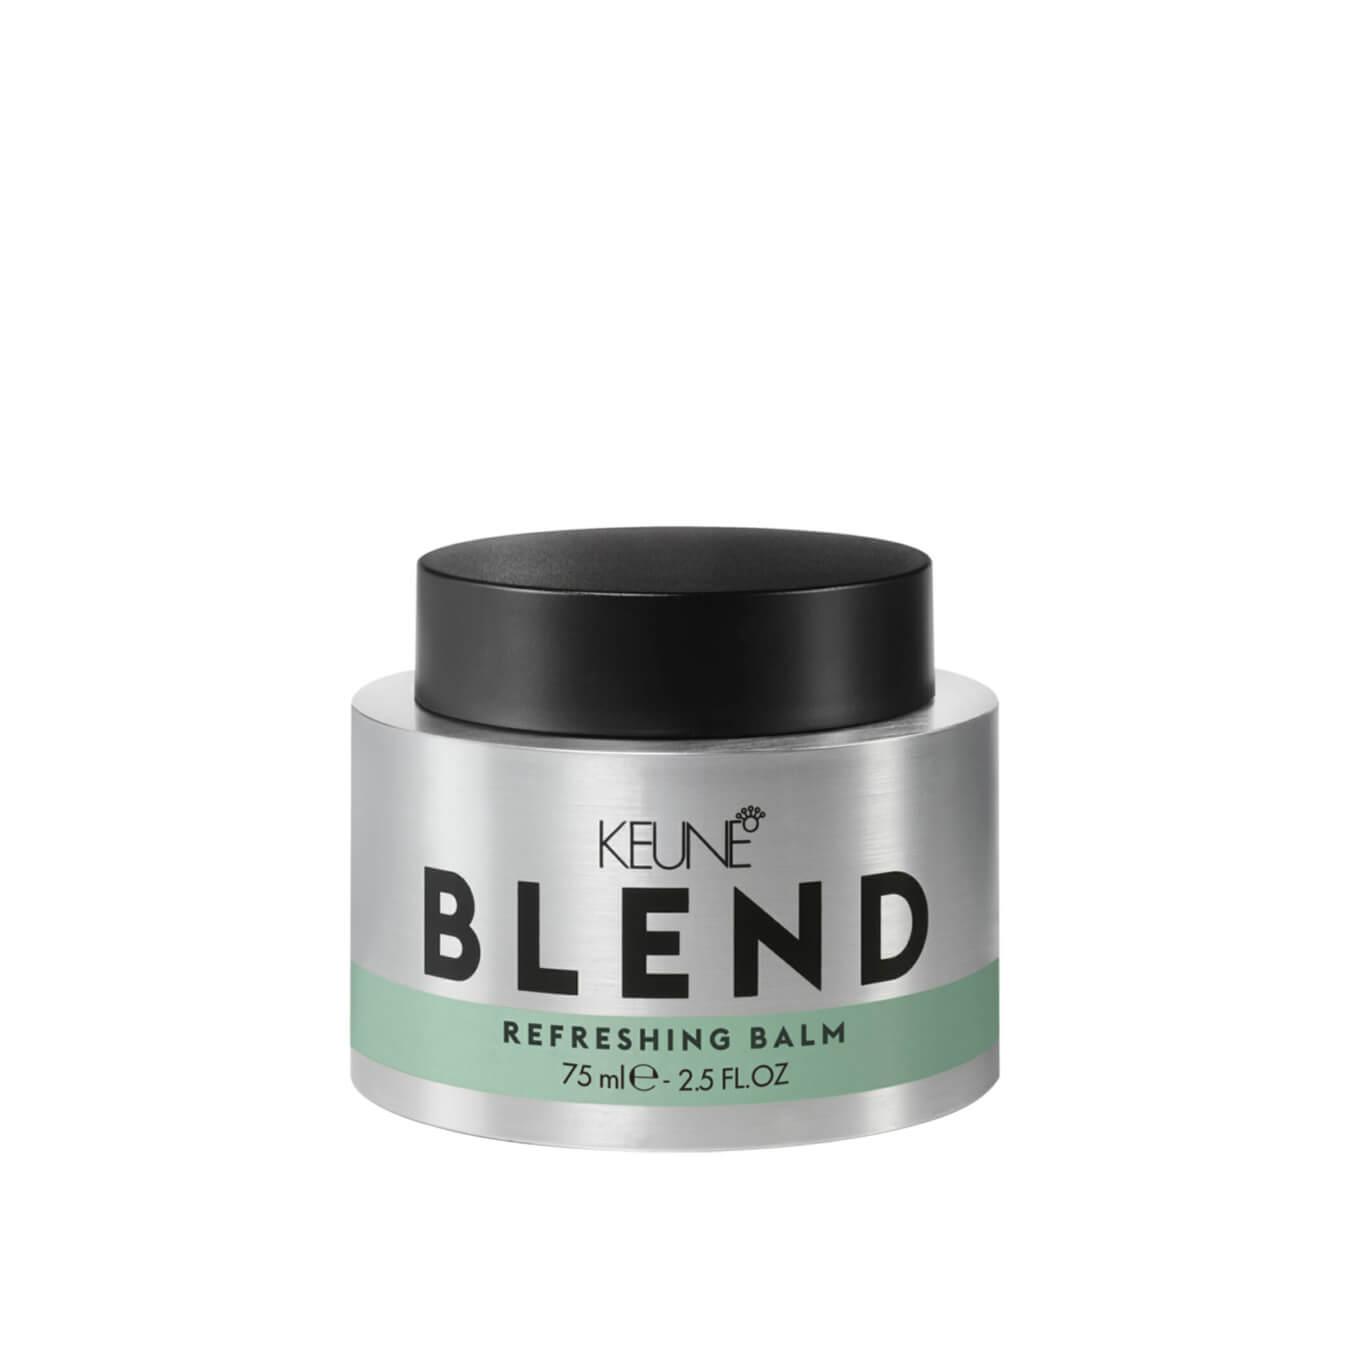 Kauf Keune Blend Refreshing Balm 75ml